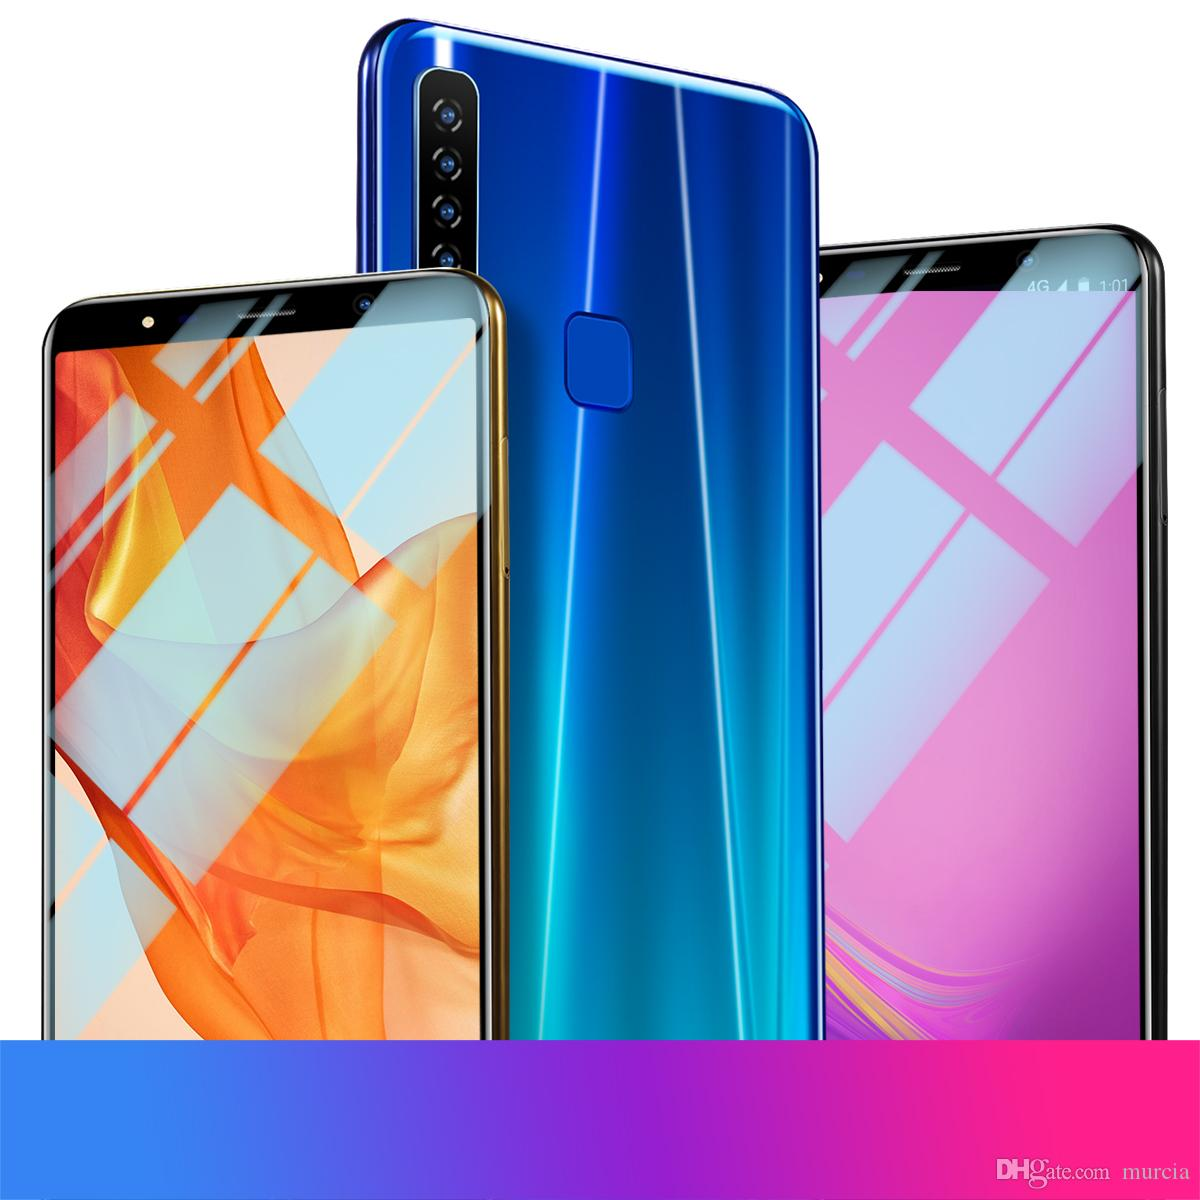 6.1HD Inch A9 Smart Phone 1GB Ram 16GB Rom Mtk6580A Quad Core Mobile Phone Notch Screen Resolution 1660x1080 Real 3800mAh Hot Sale